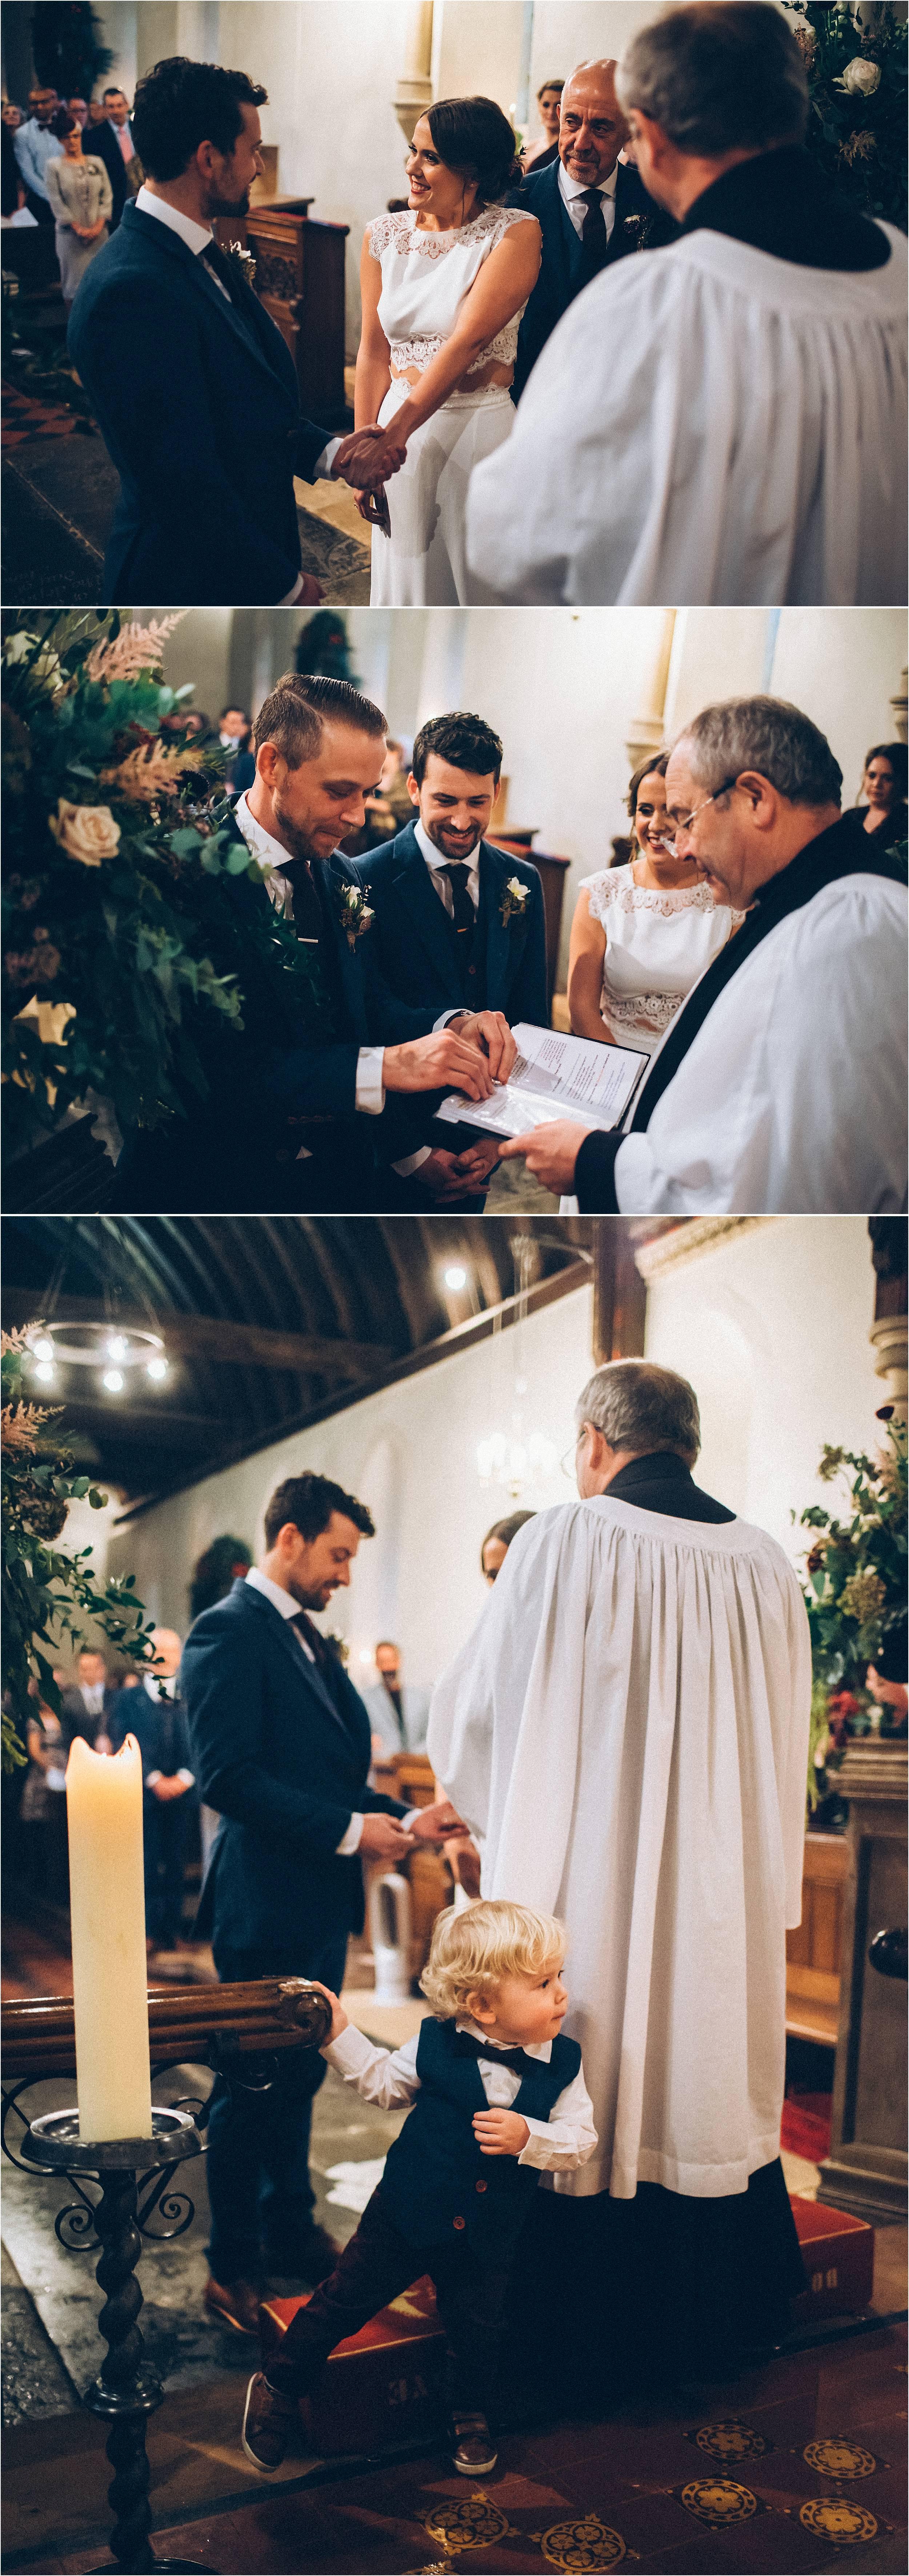 Cowley Manor Cotswolds Wedding Photographer_0052.jpg